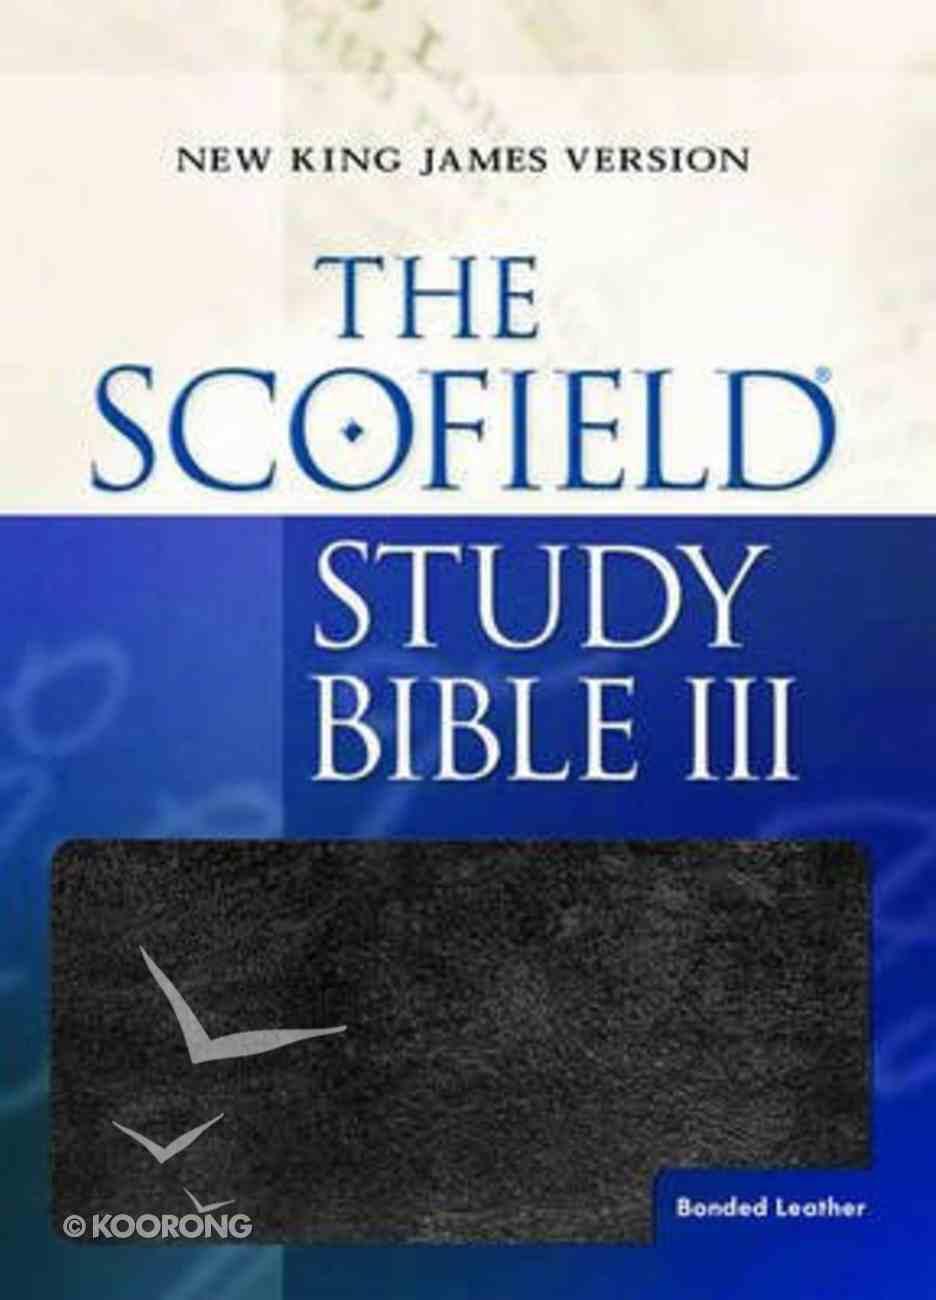 NKJV Scofield III Study Bible Black Bonded Leather